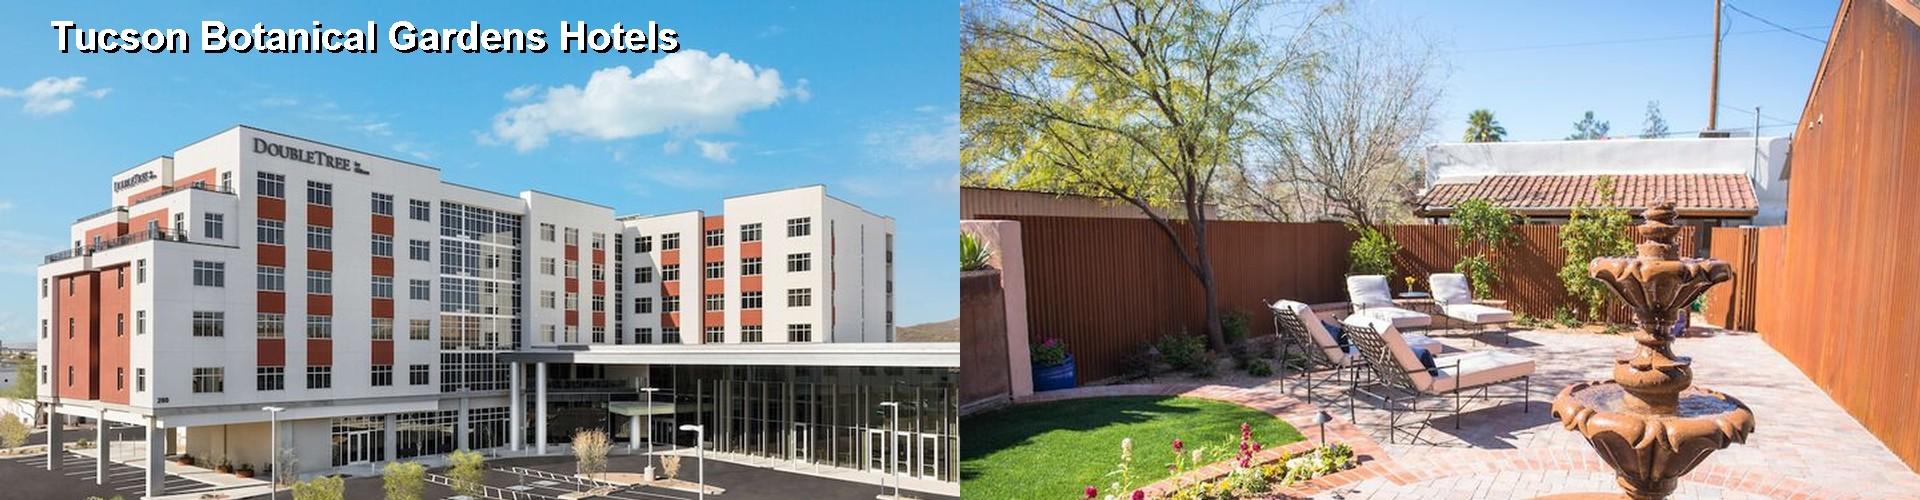 5 Best Hotels Near Tucson Botanical Gardens